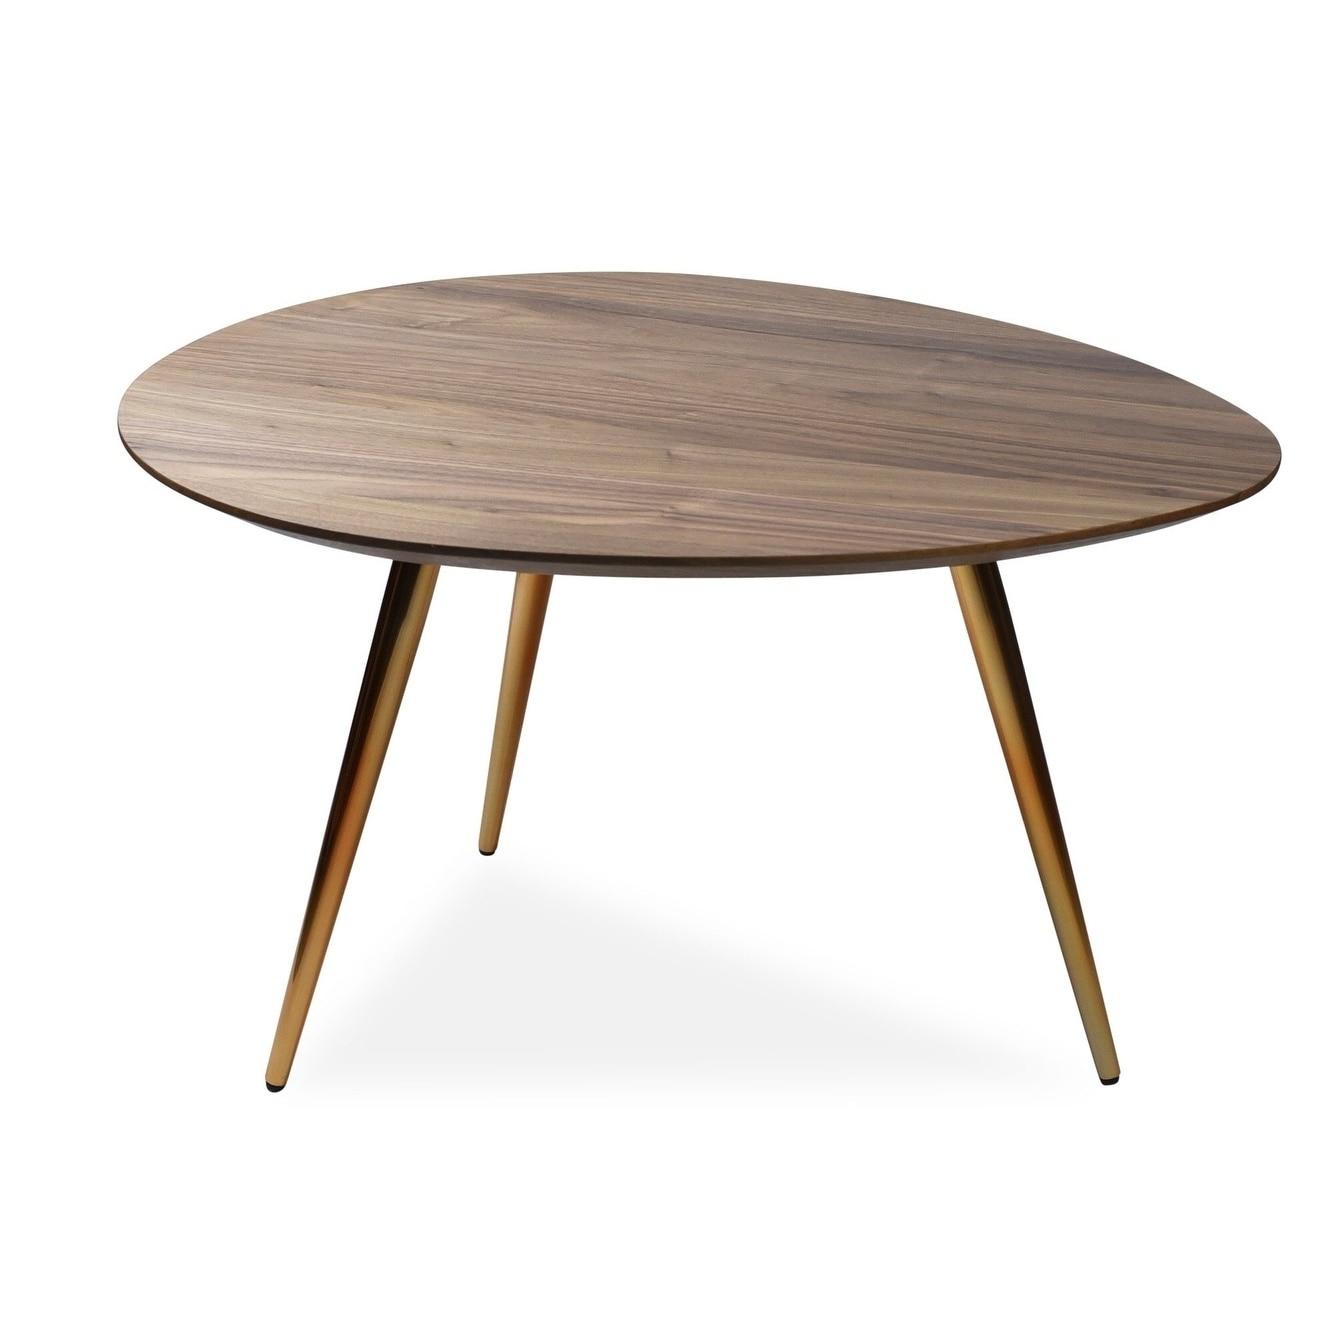 Small Mid Century Modern Living Room Wood Coffee Table